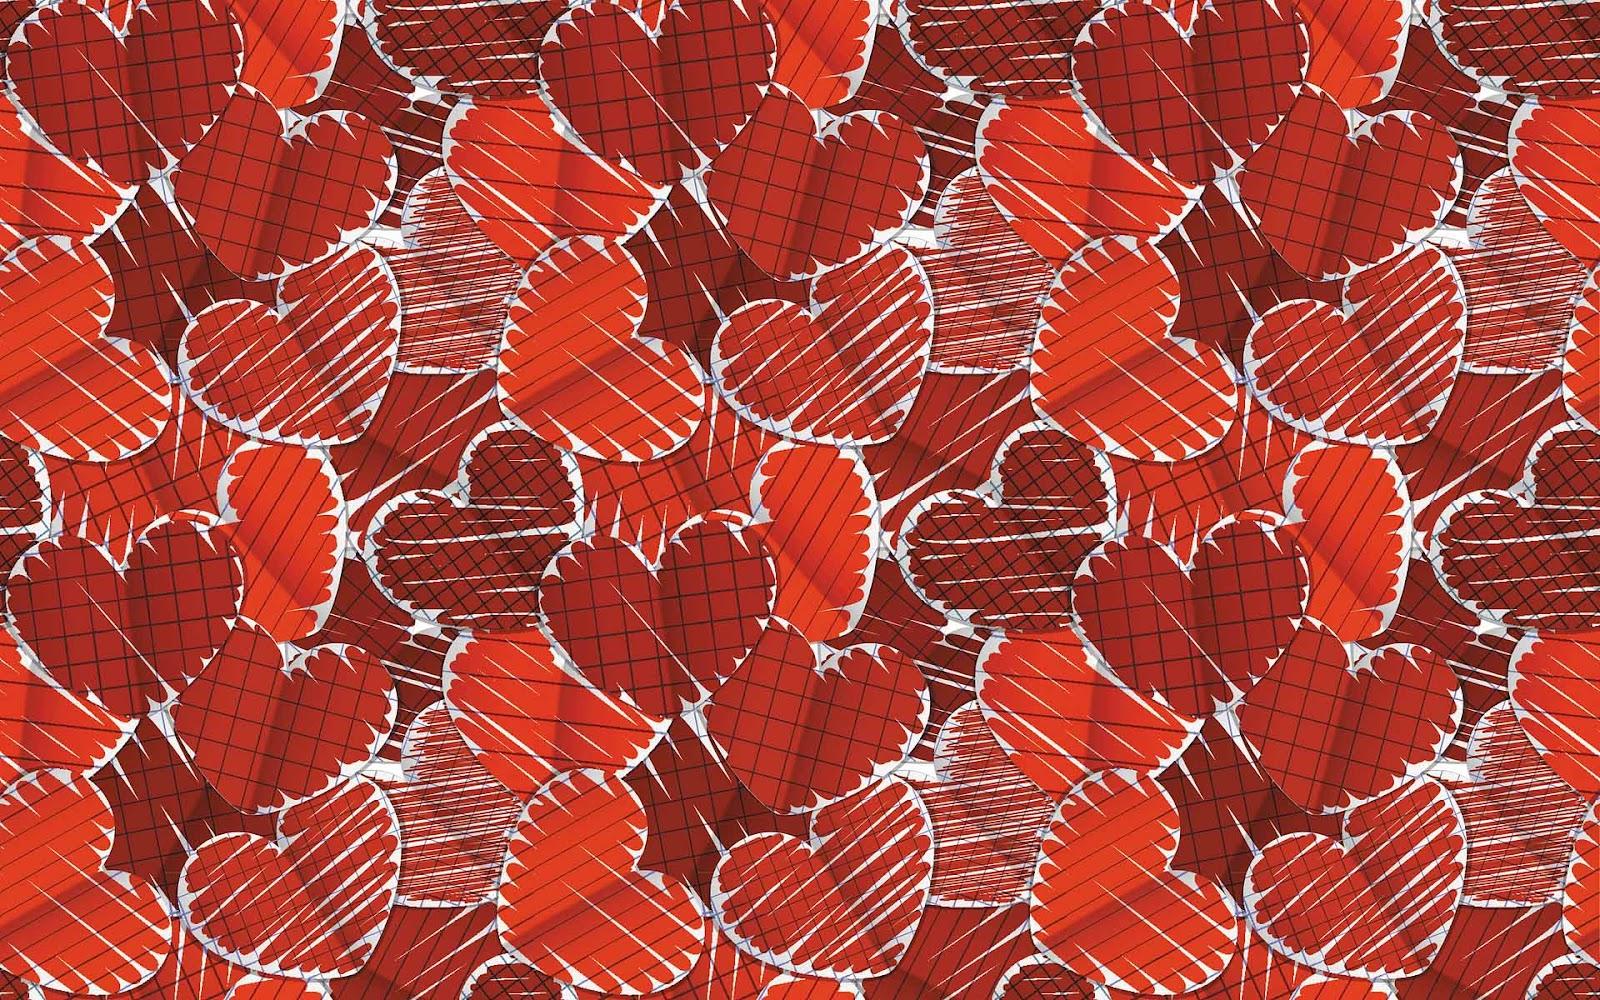 25 Mooie Liefdes Hartjes Wallpapers In Hd Kwaliteit